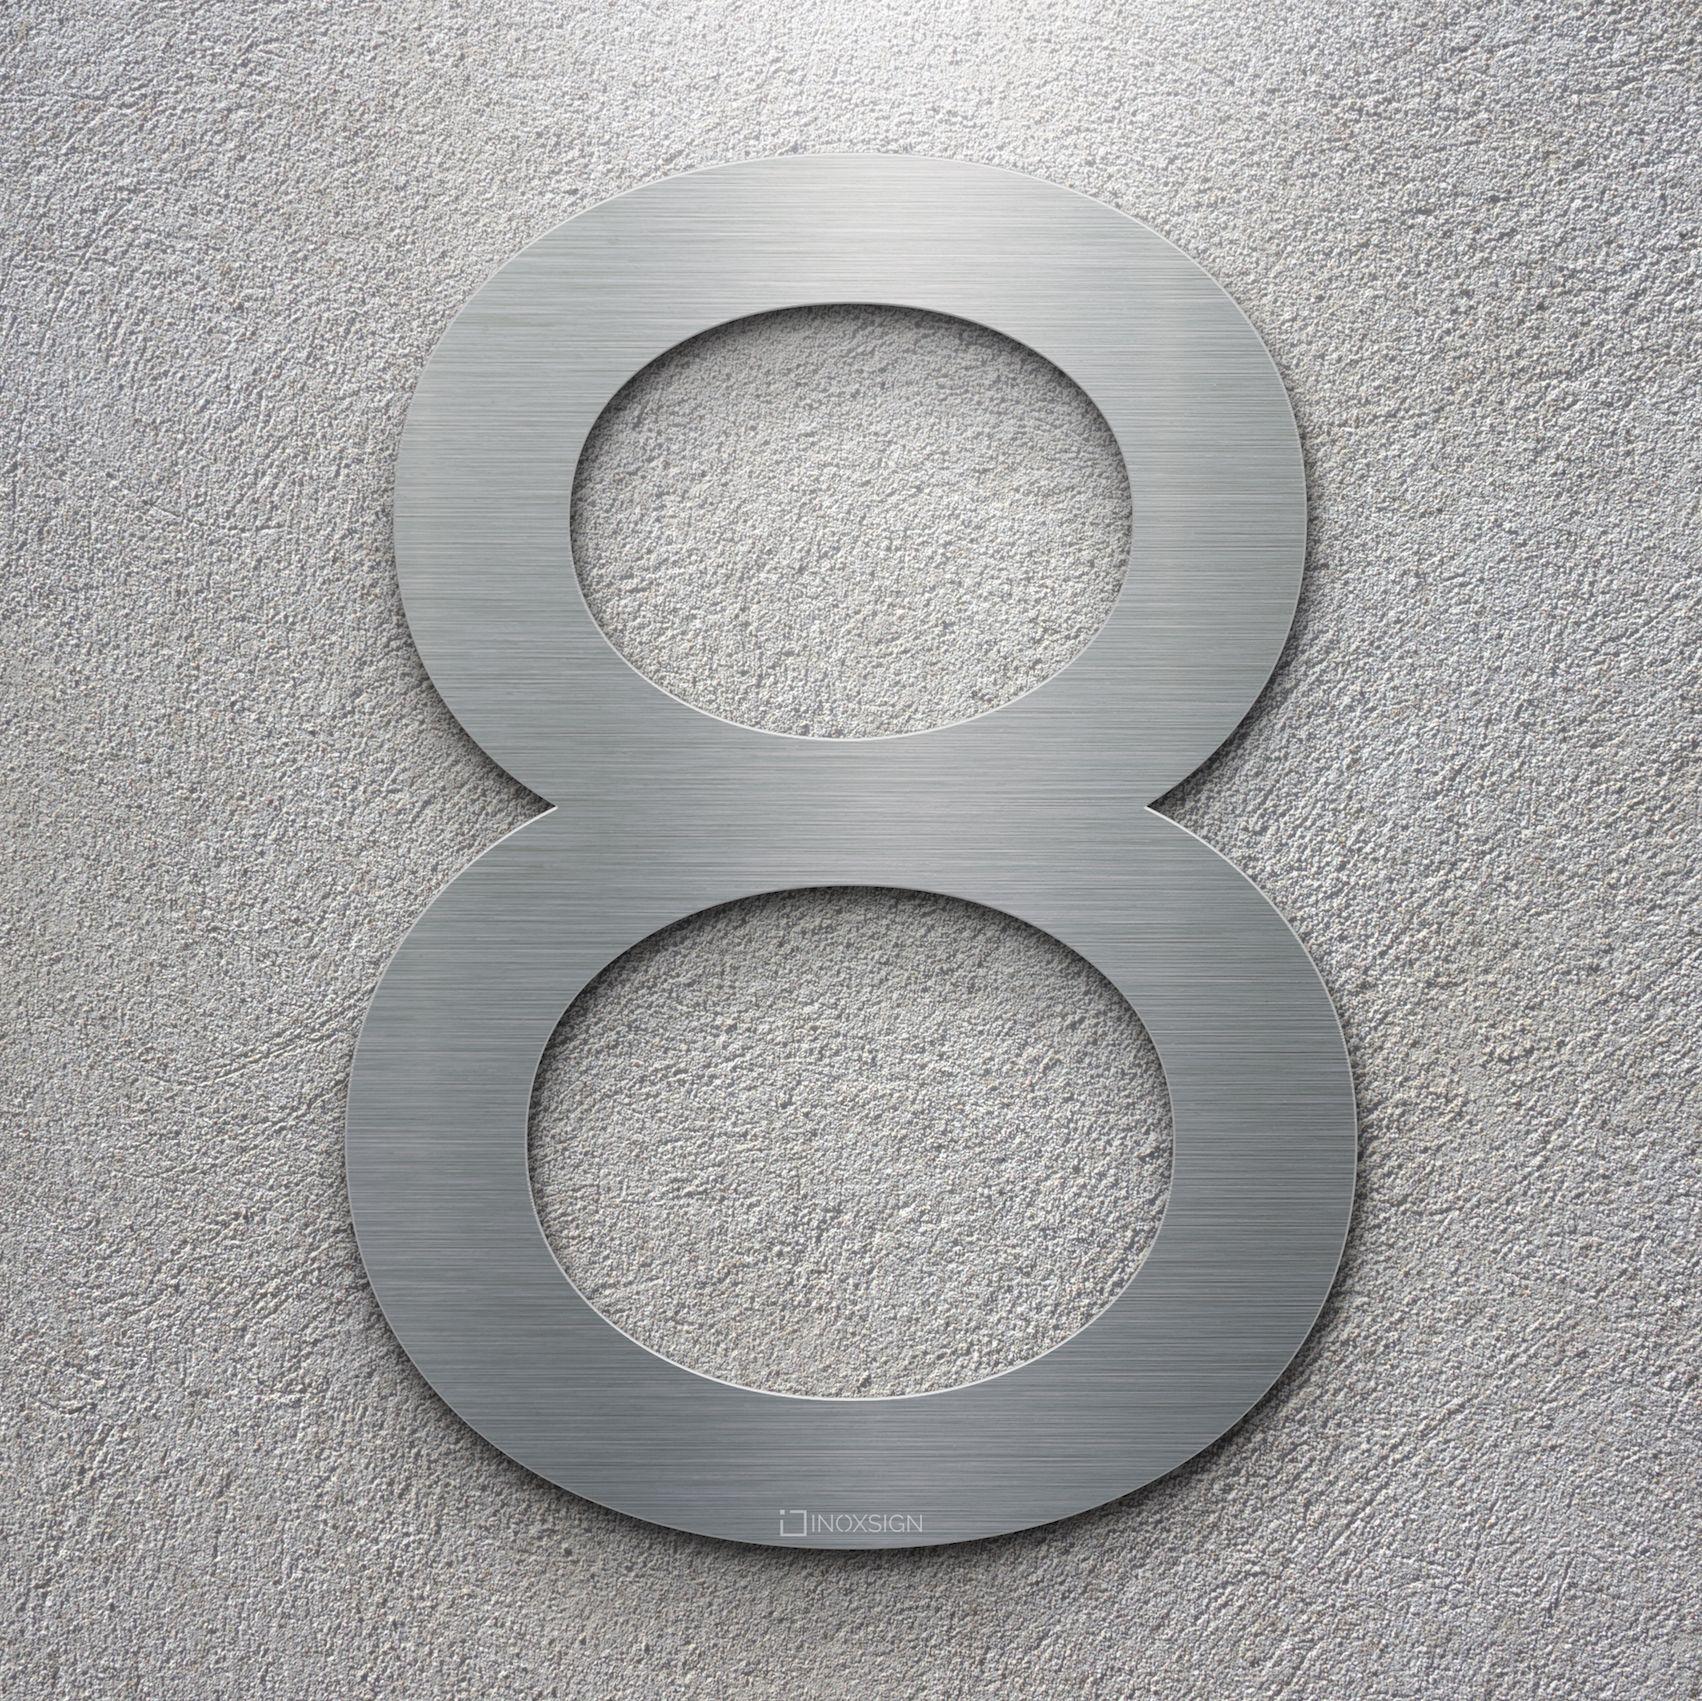 neu inoxsign klasische edelstahl hausnummer 8 moderne hausnummern aus edelstahl geb rstet. Black Bedroom Furniture Sets. Home Design Ideas